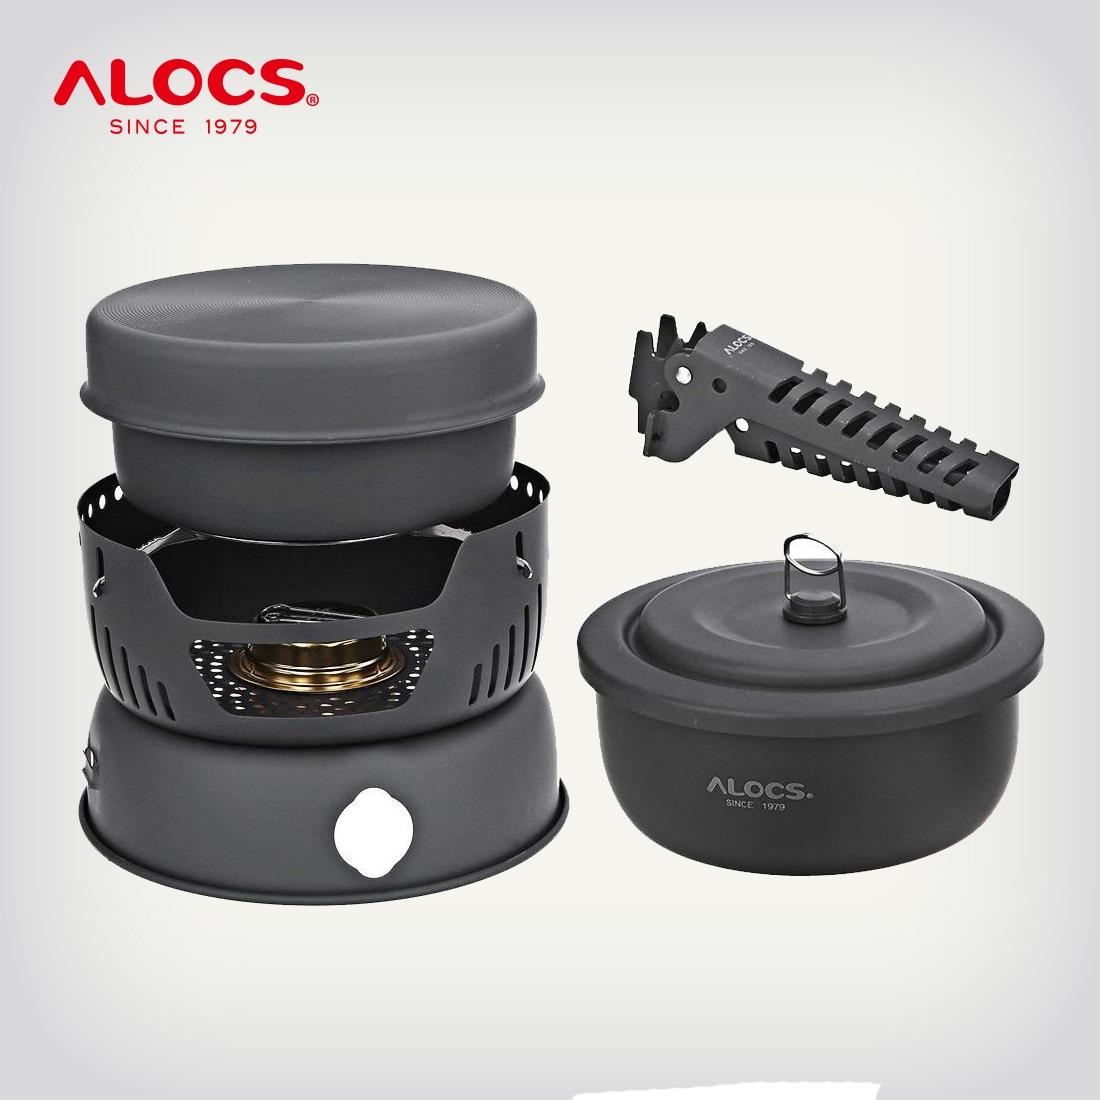 ALOCS CW-C05 Set 10 Pieces Outdoor Camping Hiking Picnic Cooking Set Utensil Spirit Stove Alcohol Burner Cooker Pot Windshield